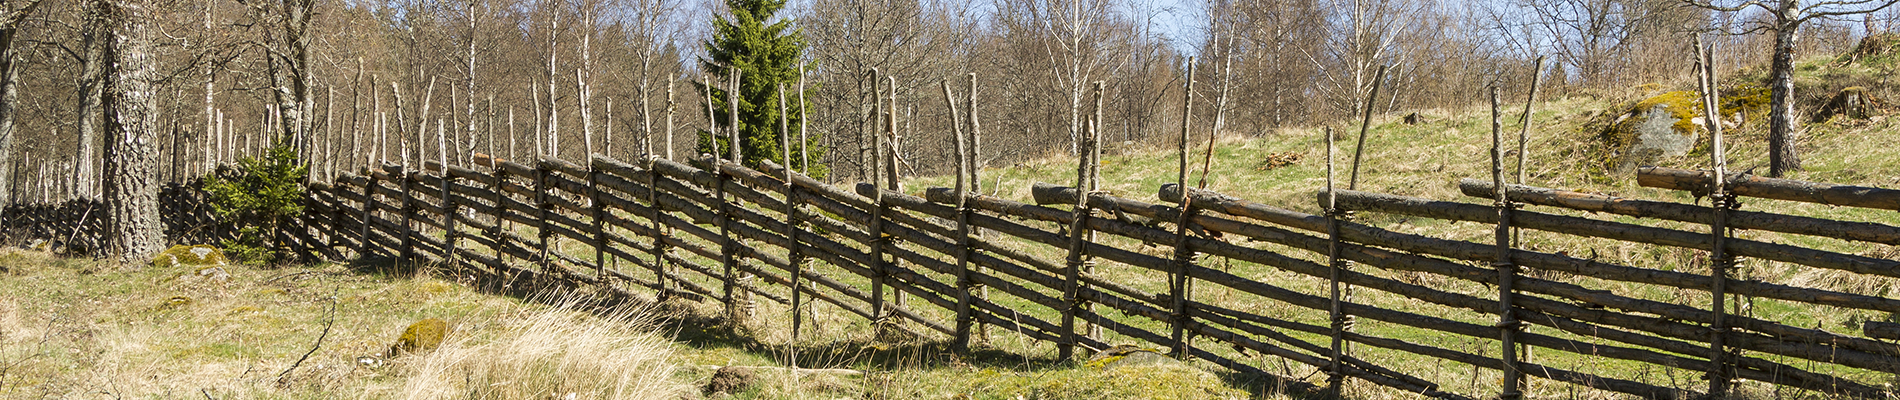 staket.png